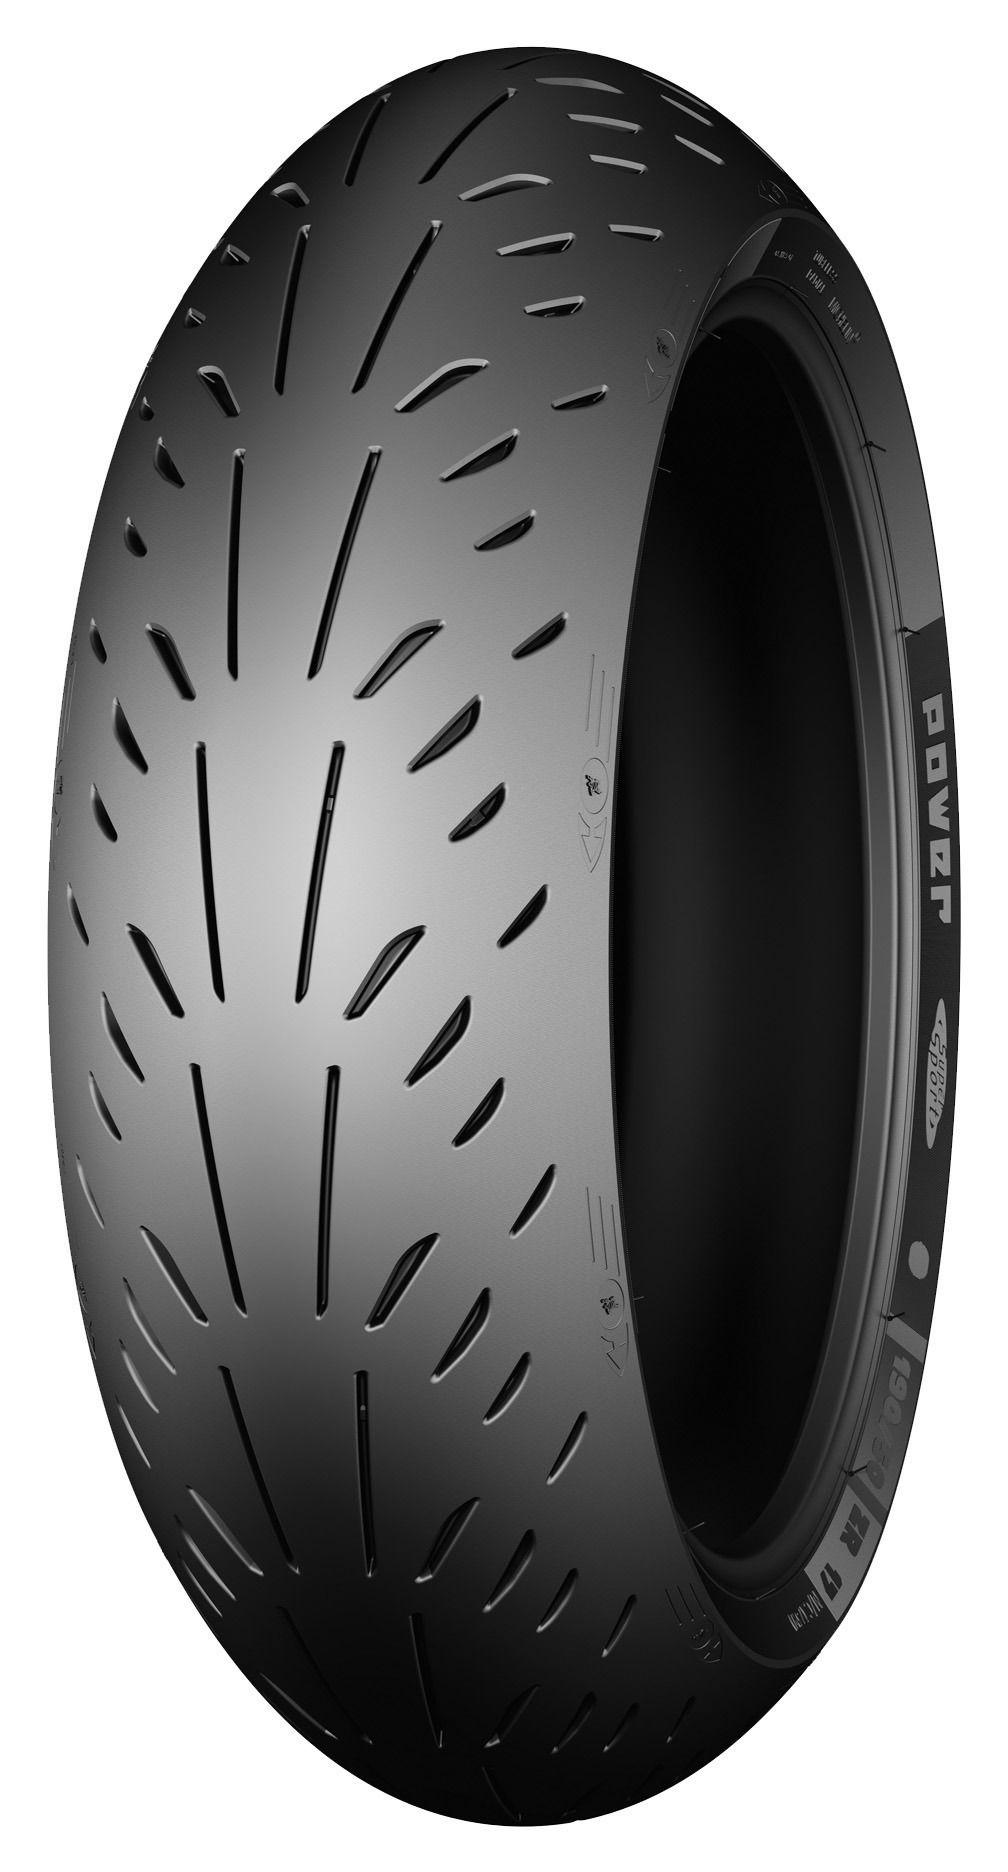 michelin power supersport rear tires revzilla. Black Bedroom Furniture Sets. Home Design Ideas